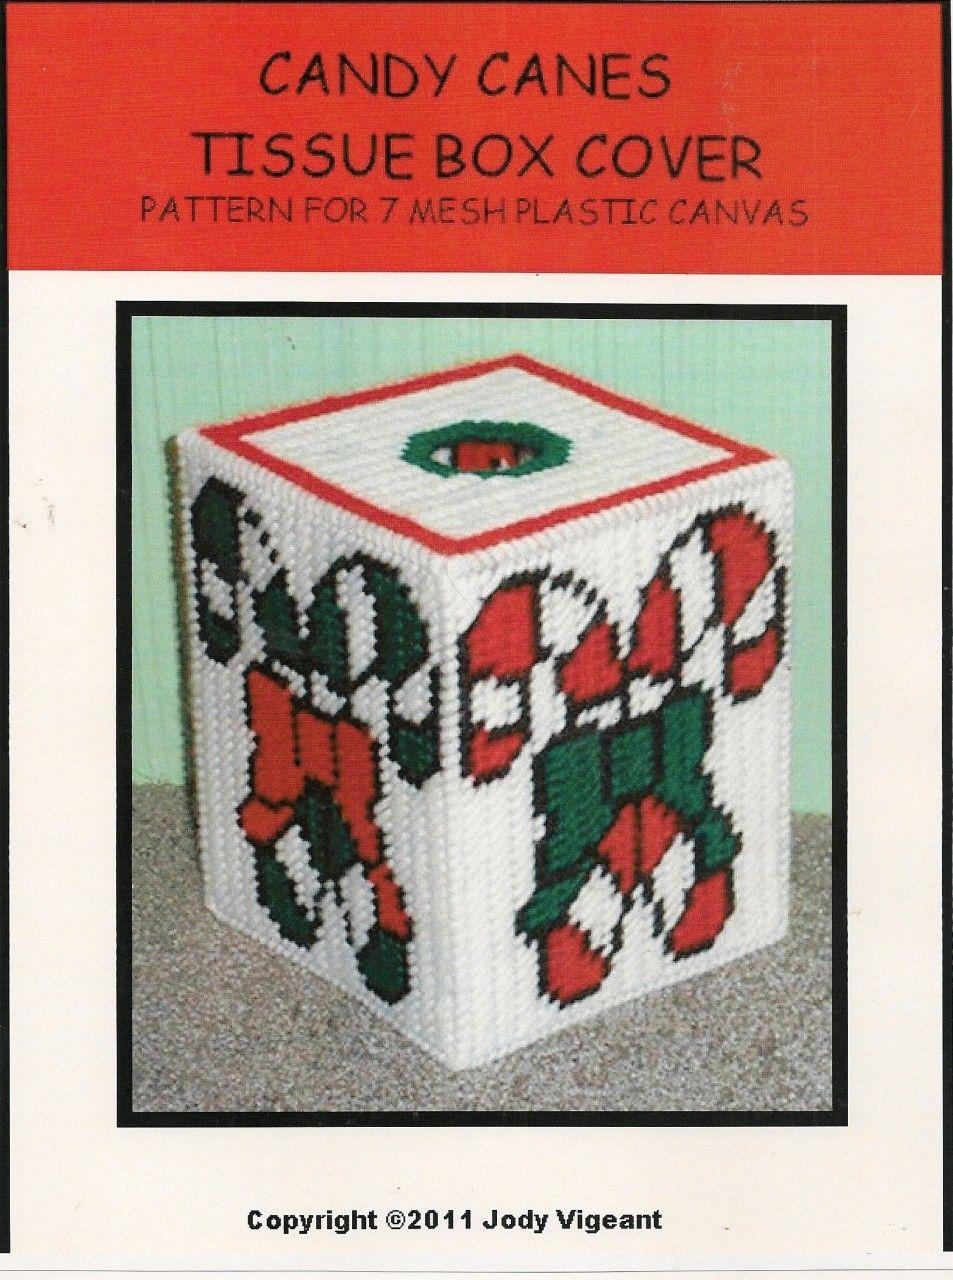 Free Plastic Canvas Tissue Box Patterns Plastic Canvas Candy Cane